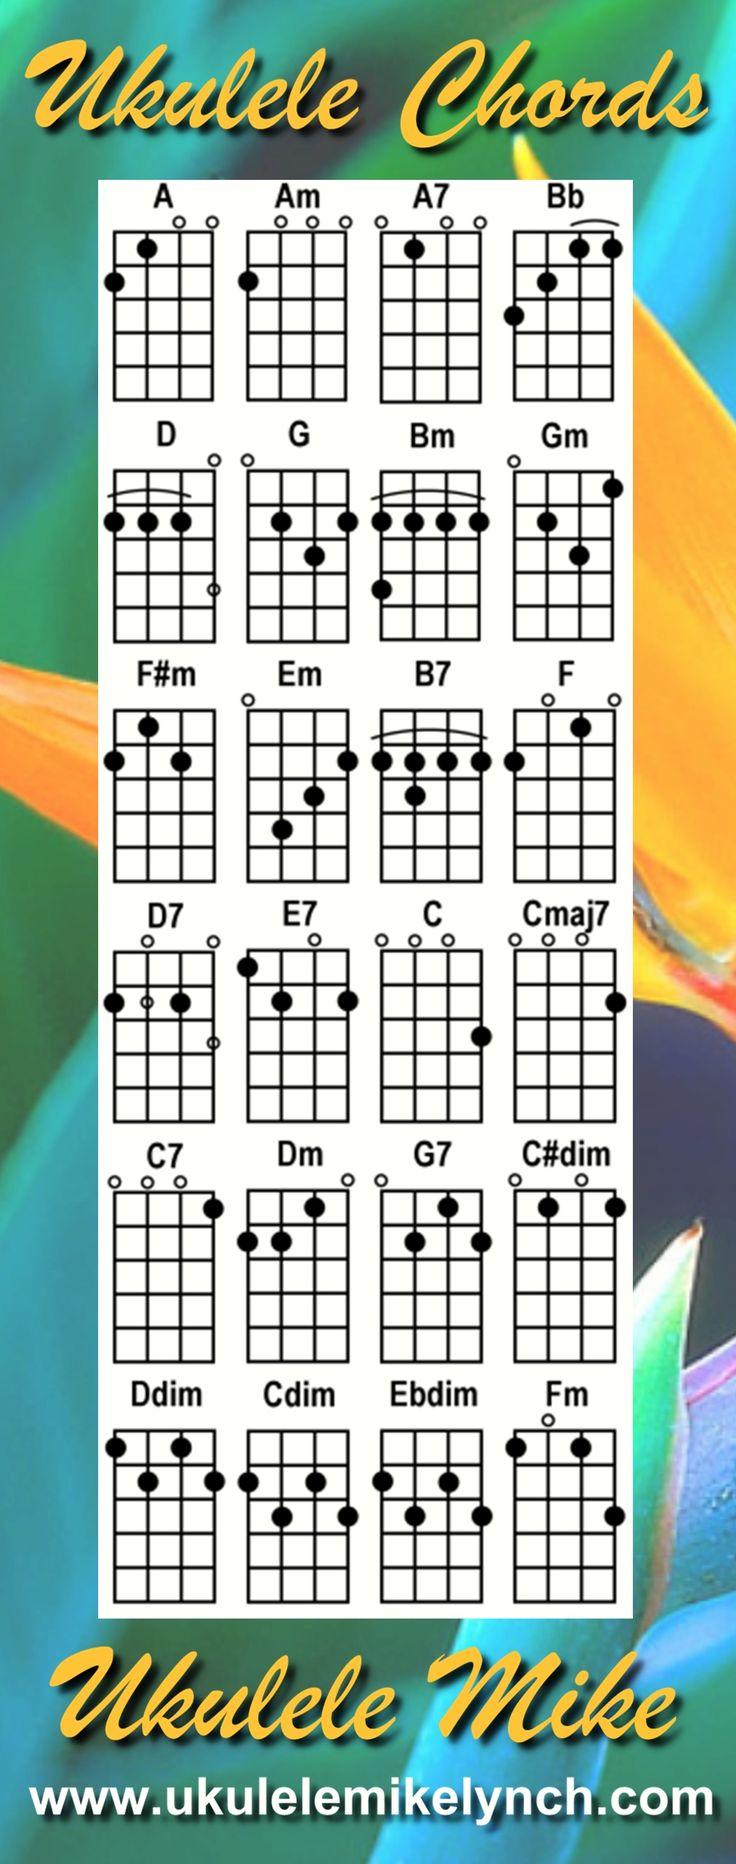 54 best ukulele images on pinterest music cartoons and crafts ukulele mike chord bookmark all the most frequently used ukulele chords hexwebz Image collections